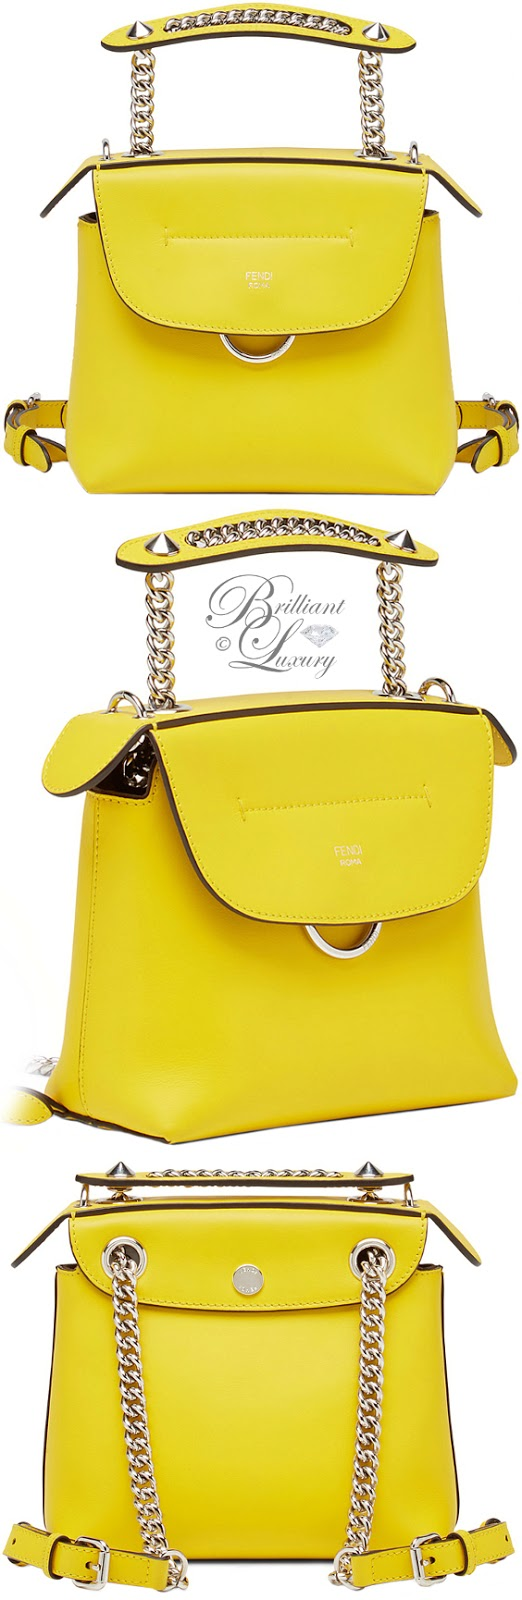 Brilliant Luxury ♦ Fendi mini yellow back to school backpack bag